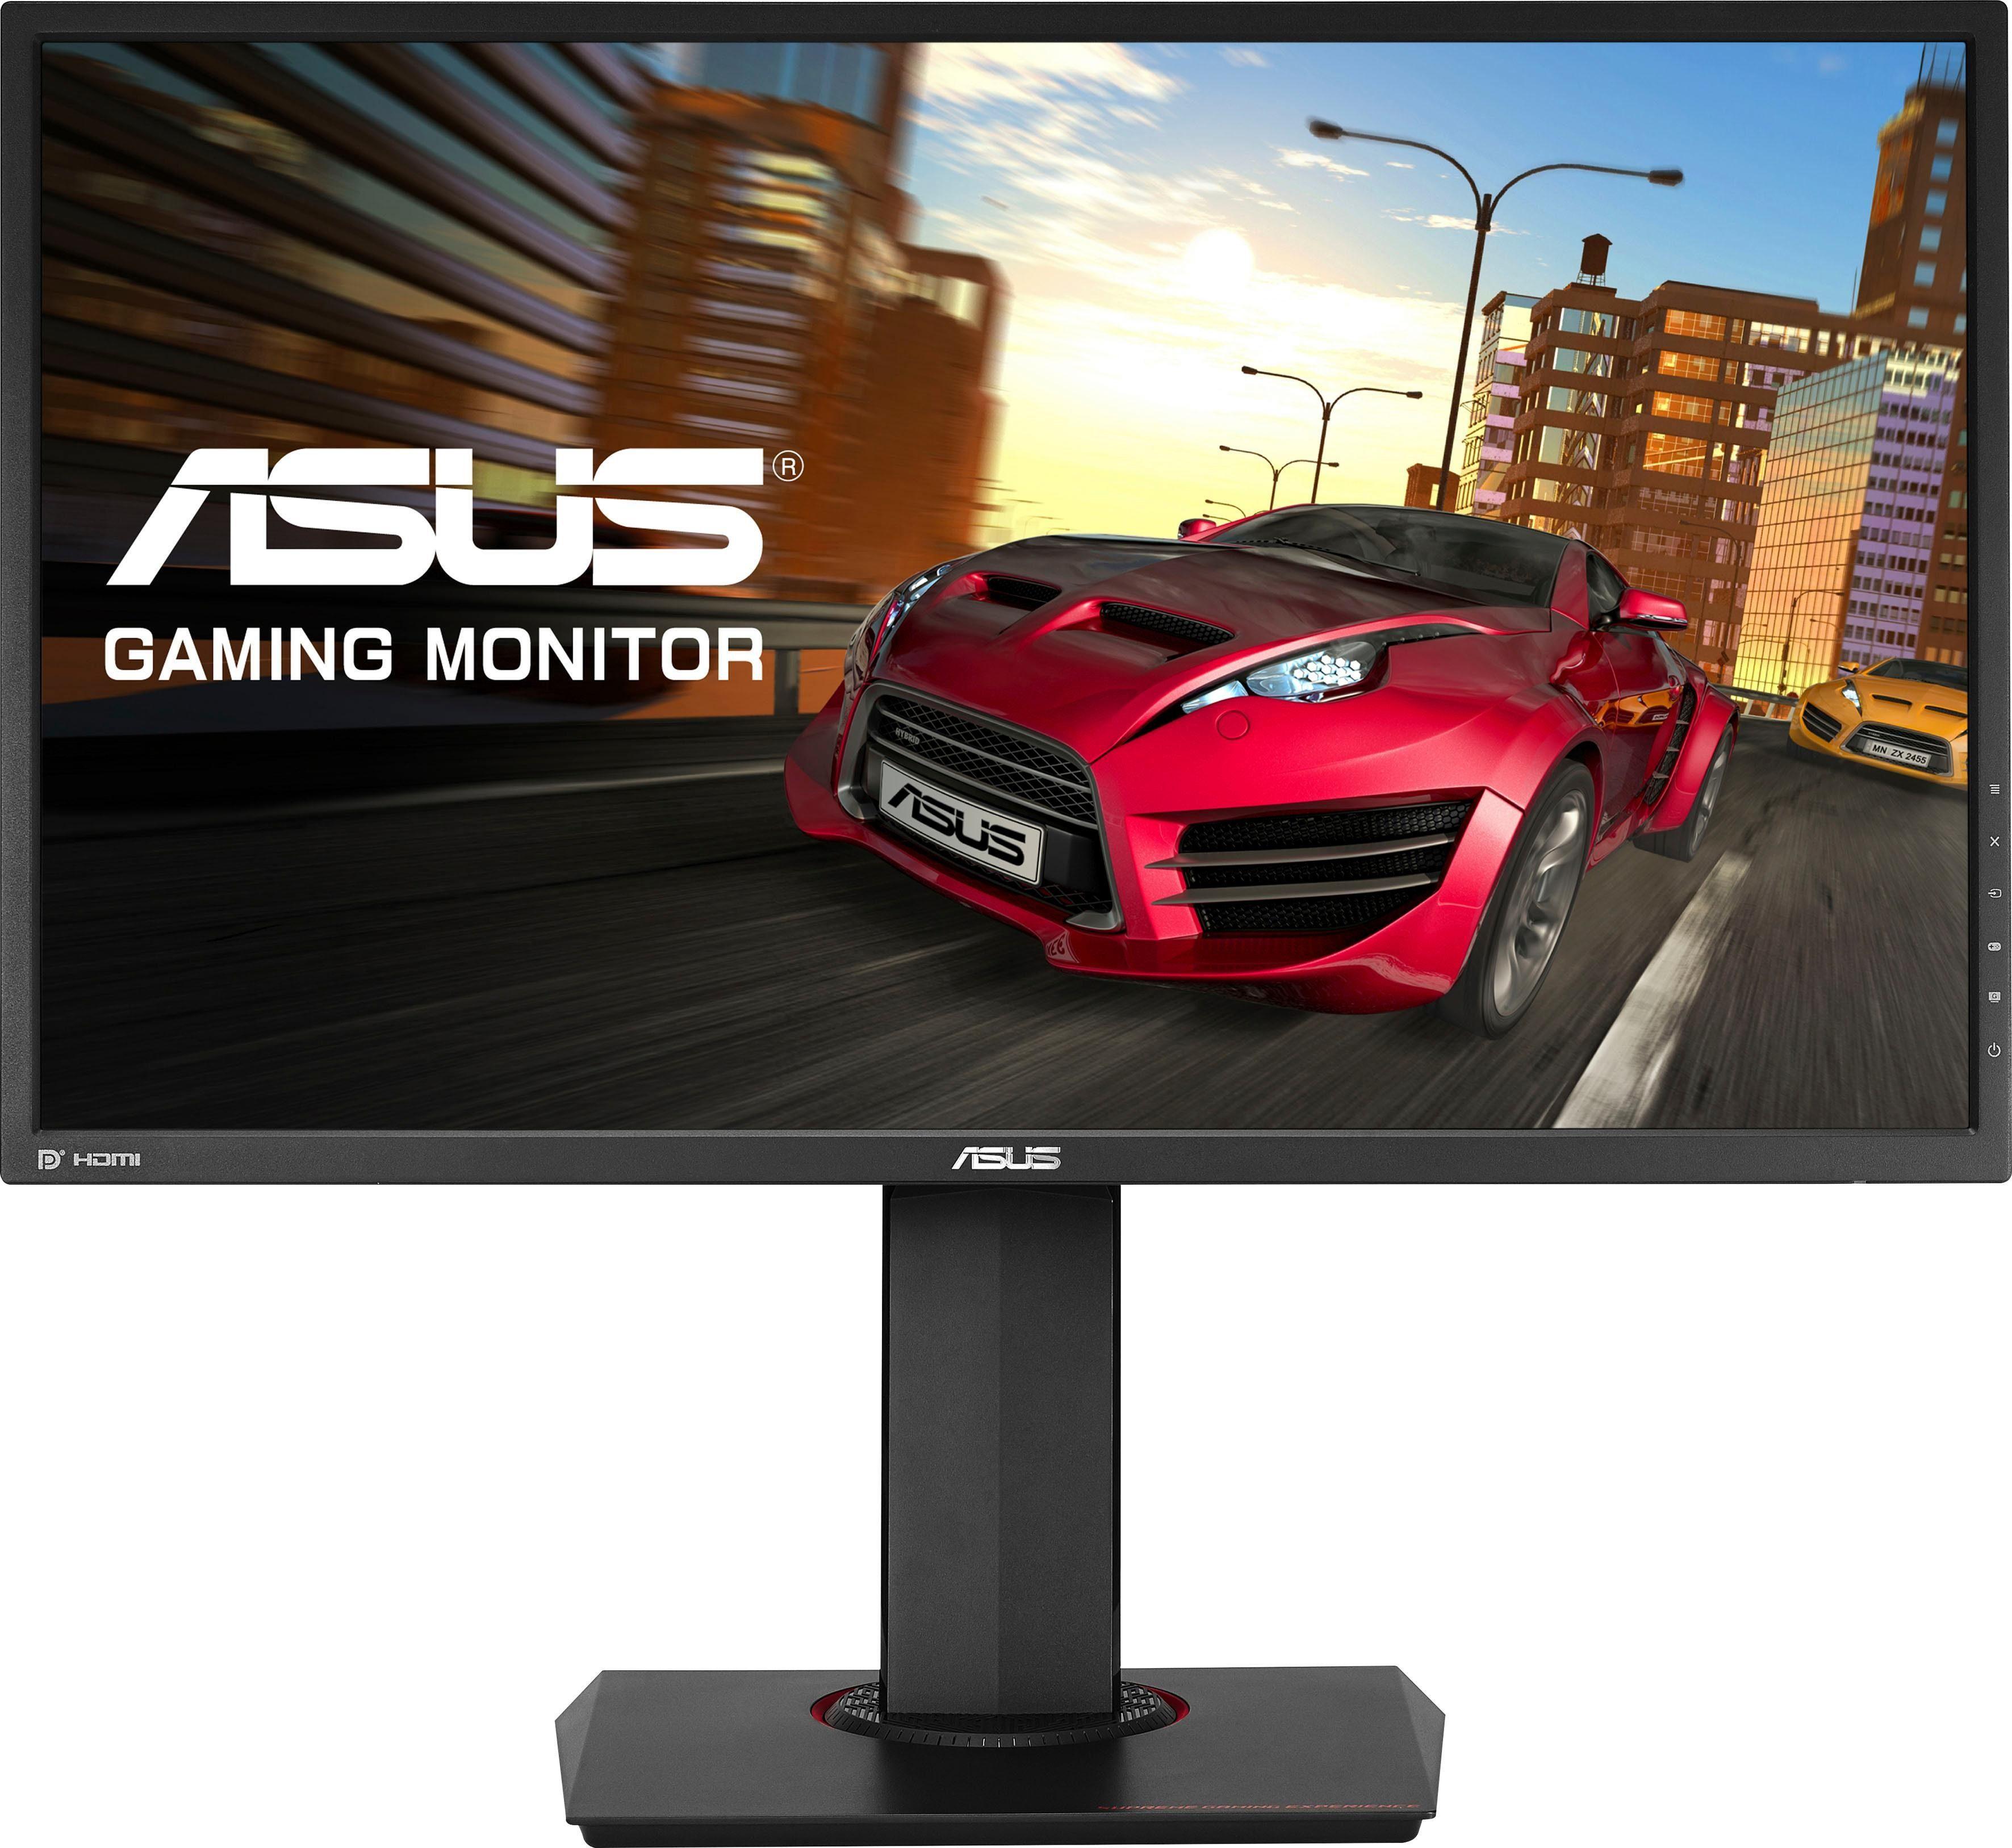 Asus MG278Q Gaming-LED-Monitor (WQHD, 1 ms Reaktionszeit, 144 Hz)